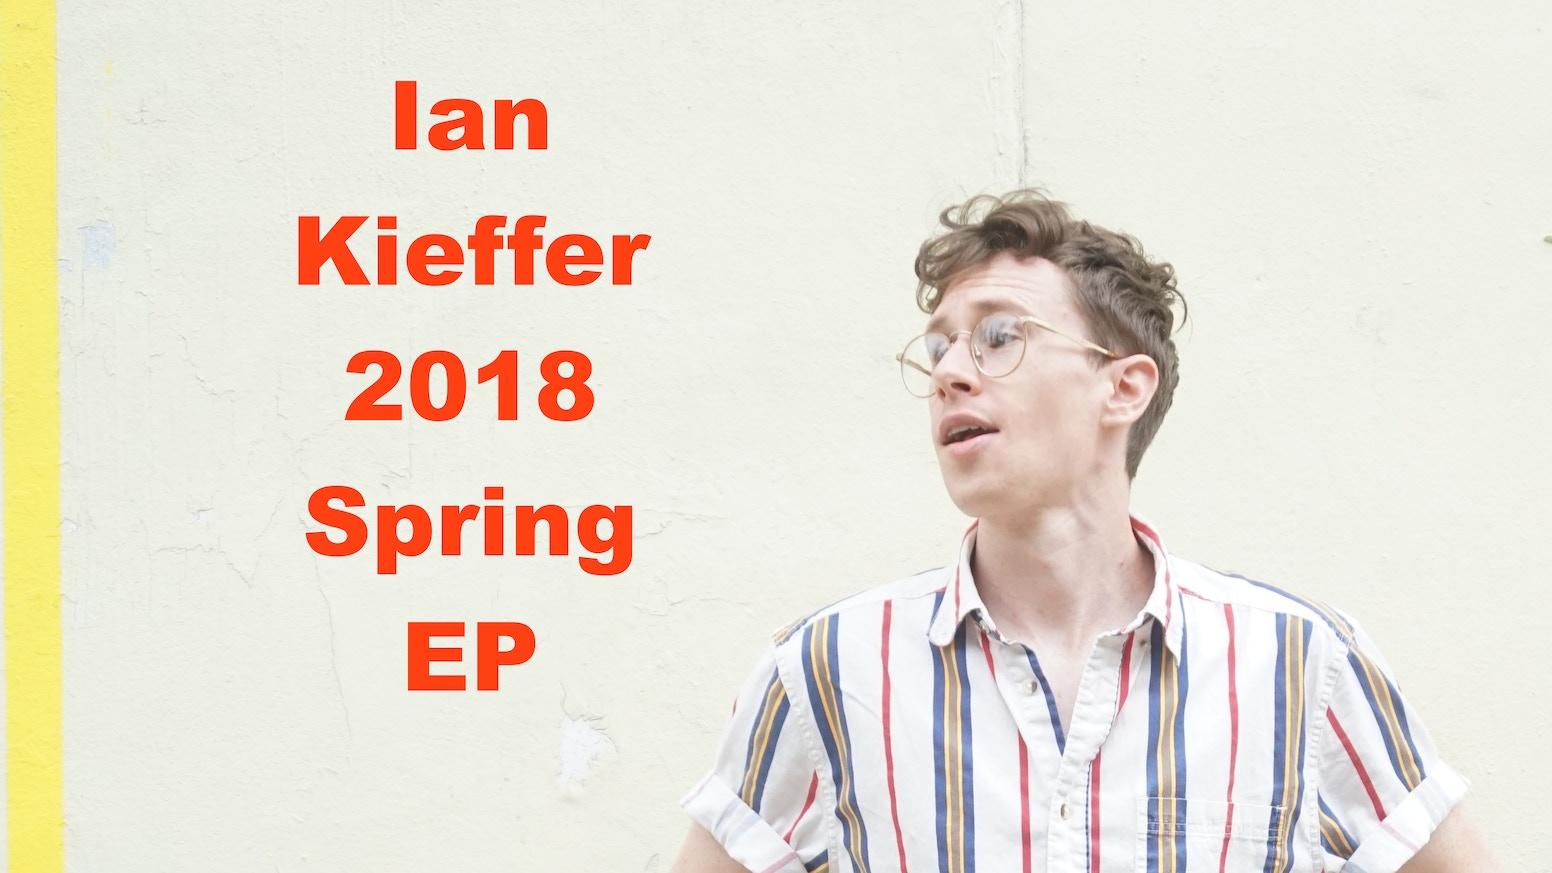 Ian Kieffer, Spring 2018 EP